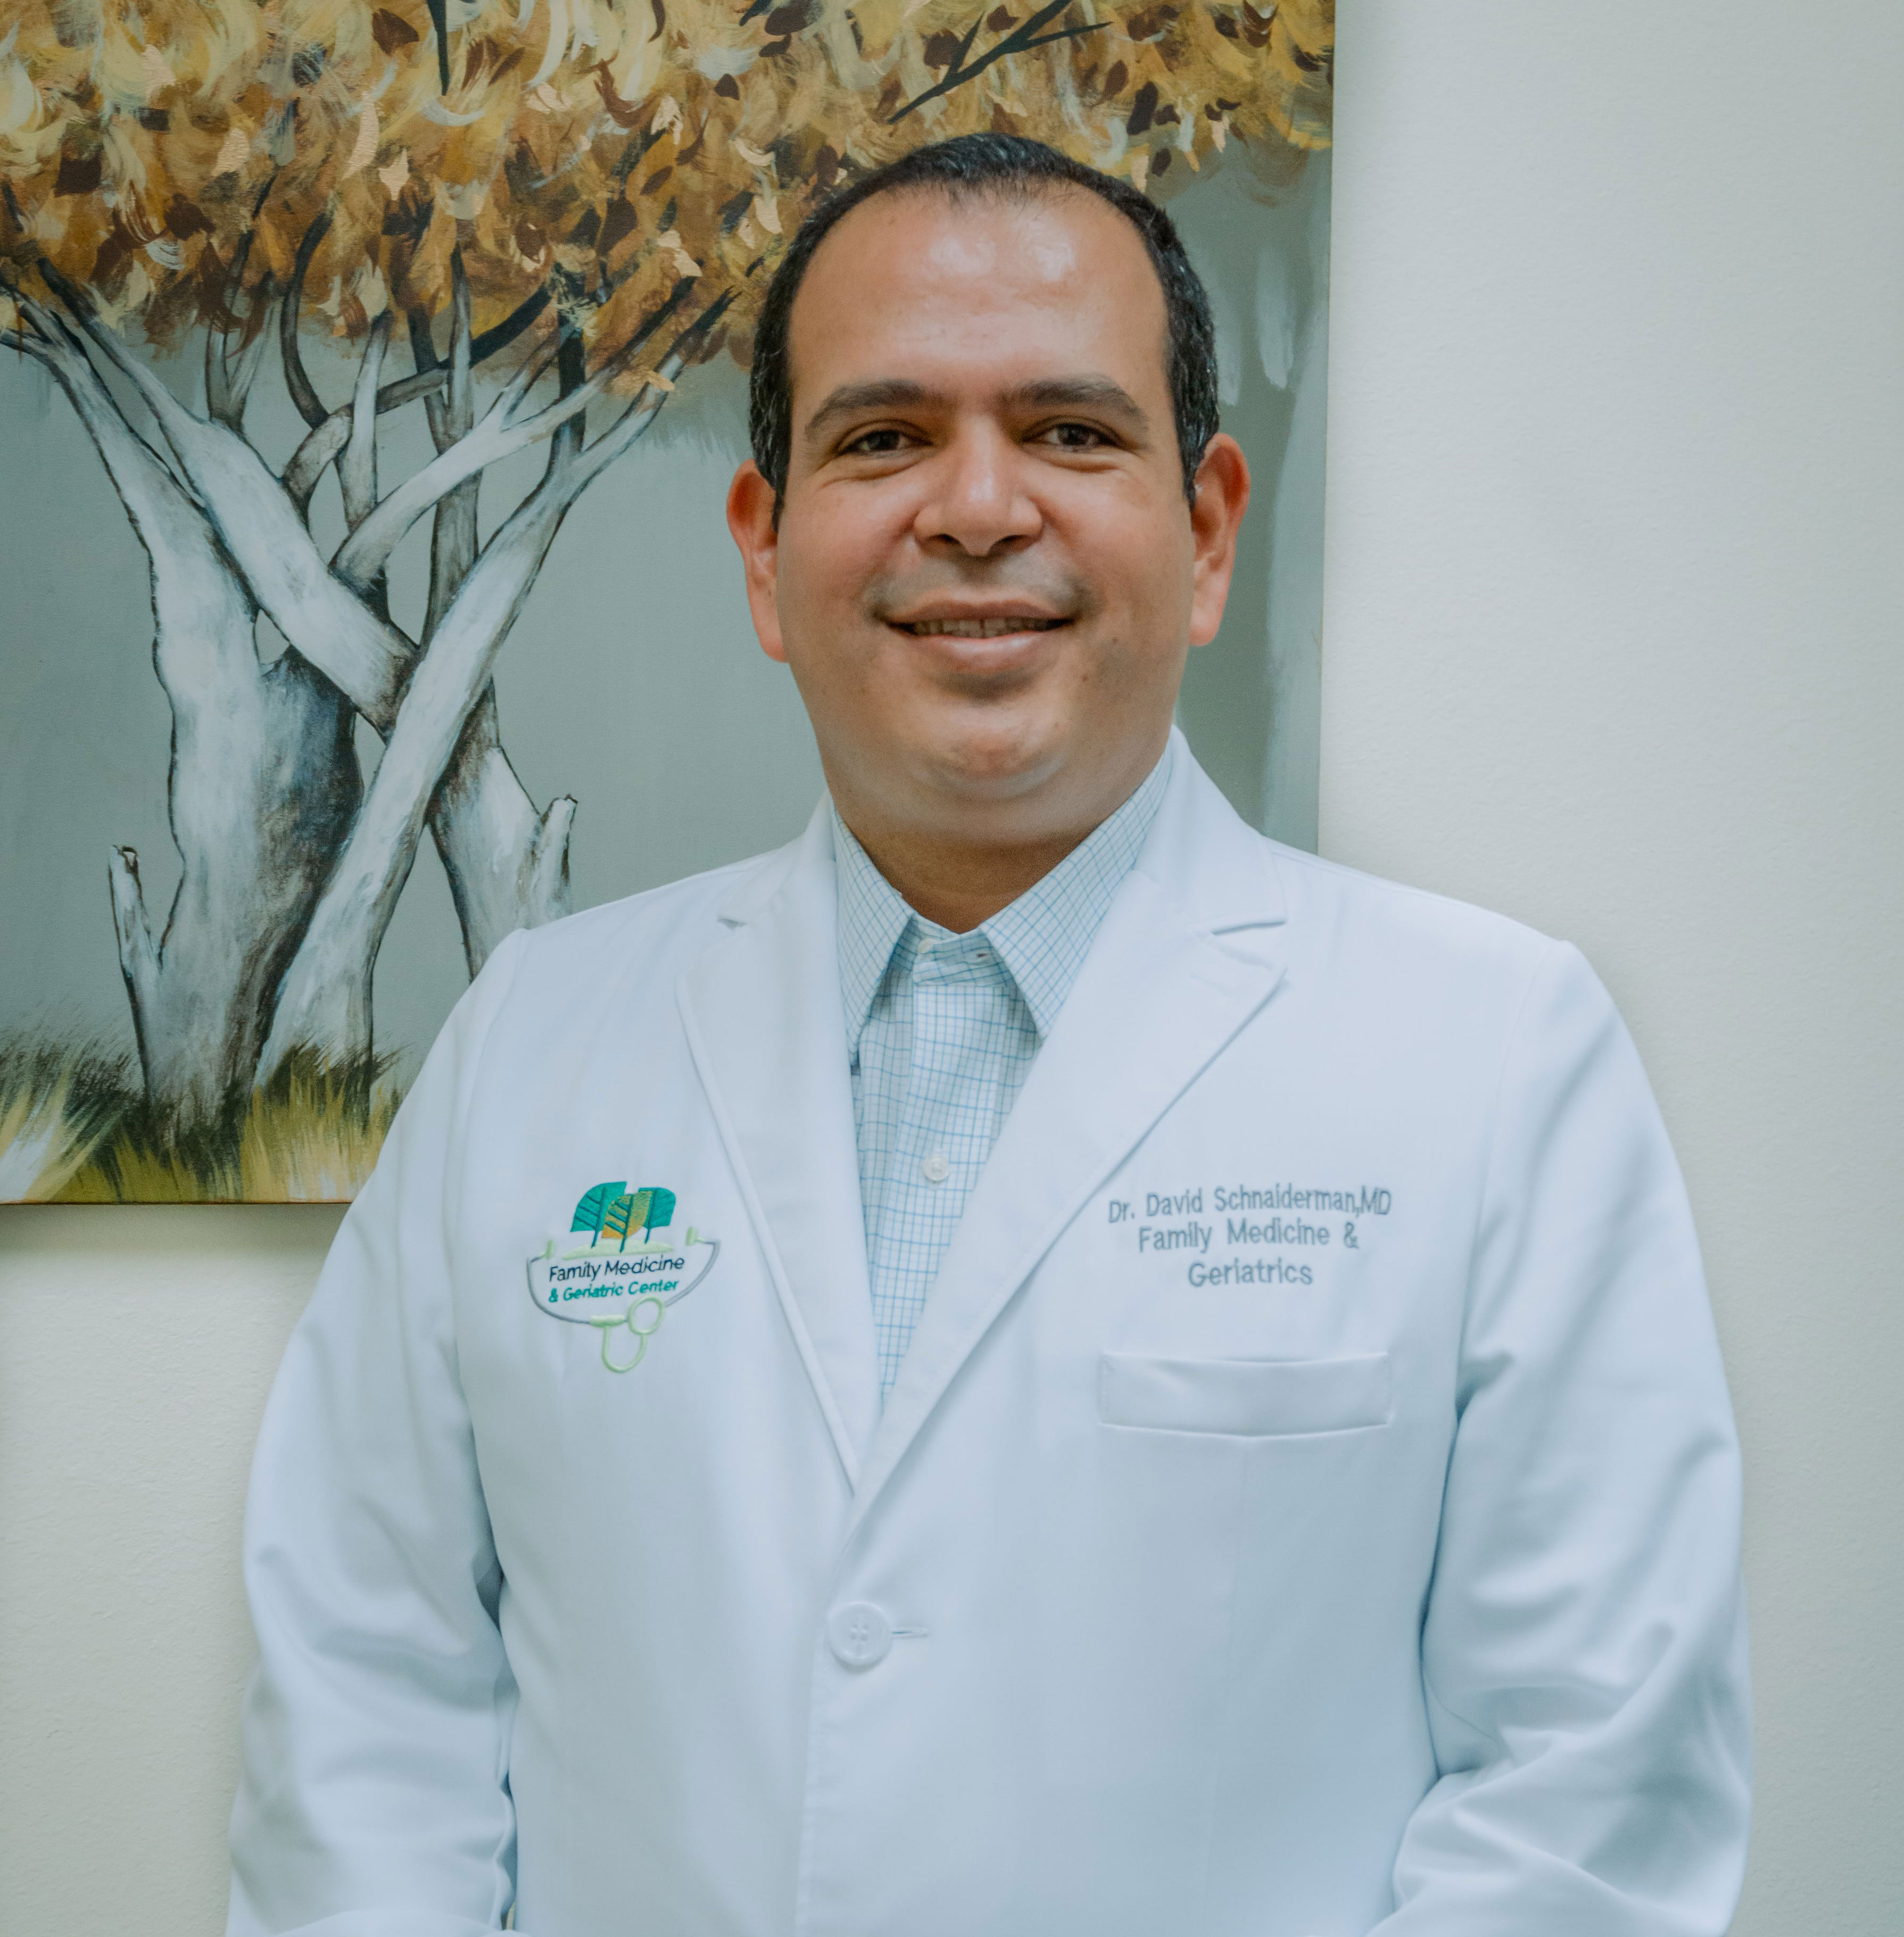 Dr. David Schnaiderman